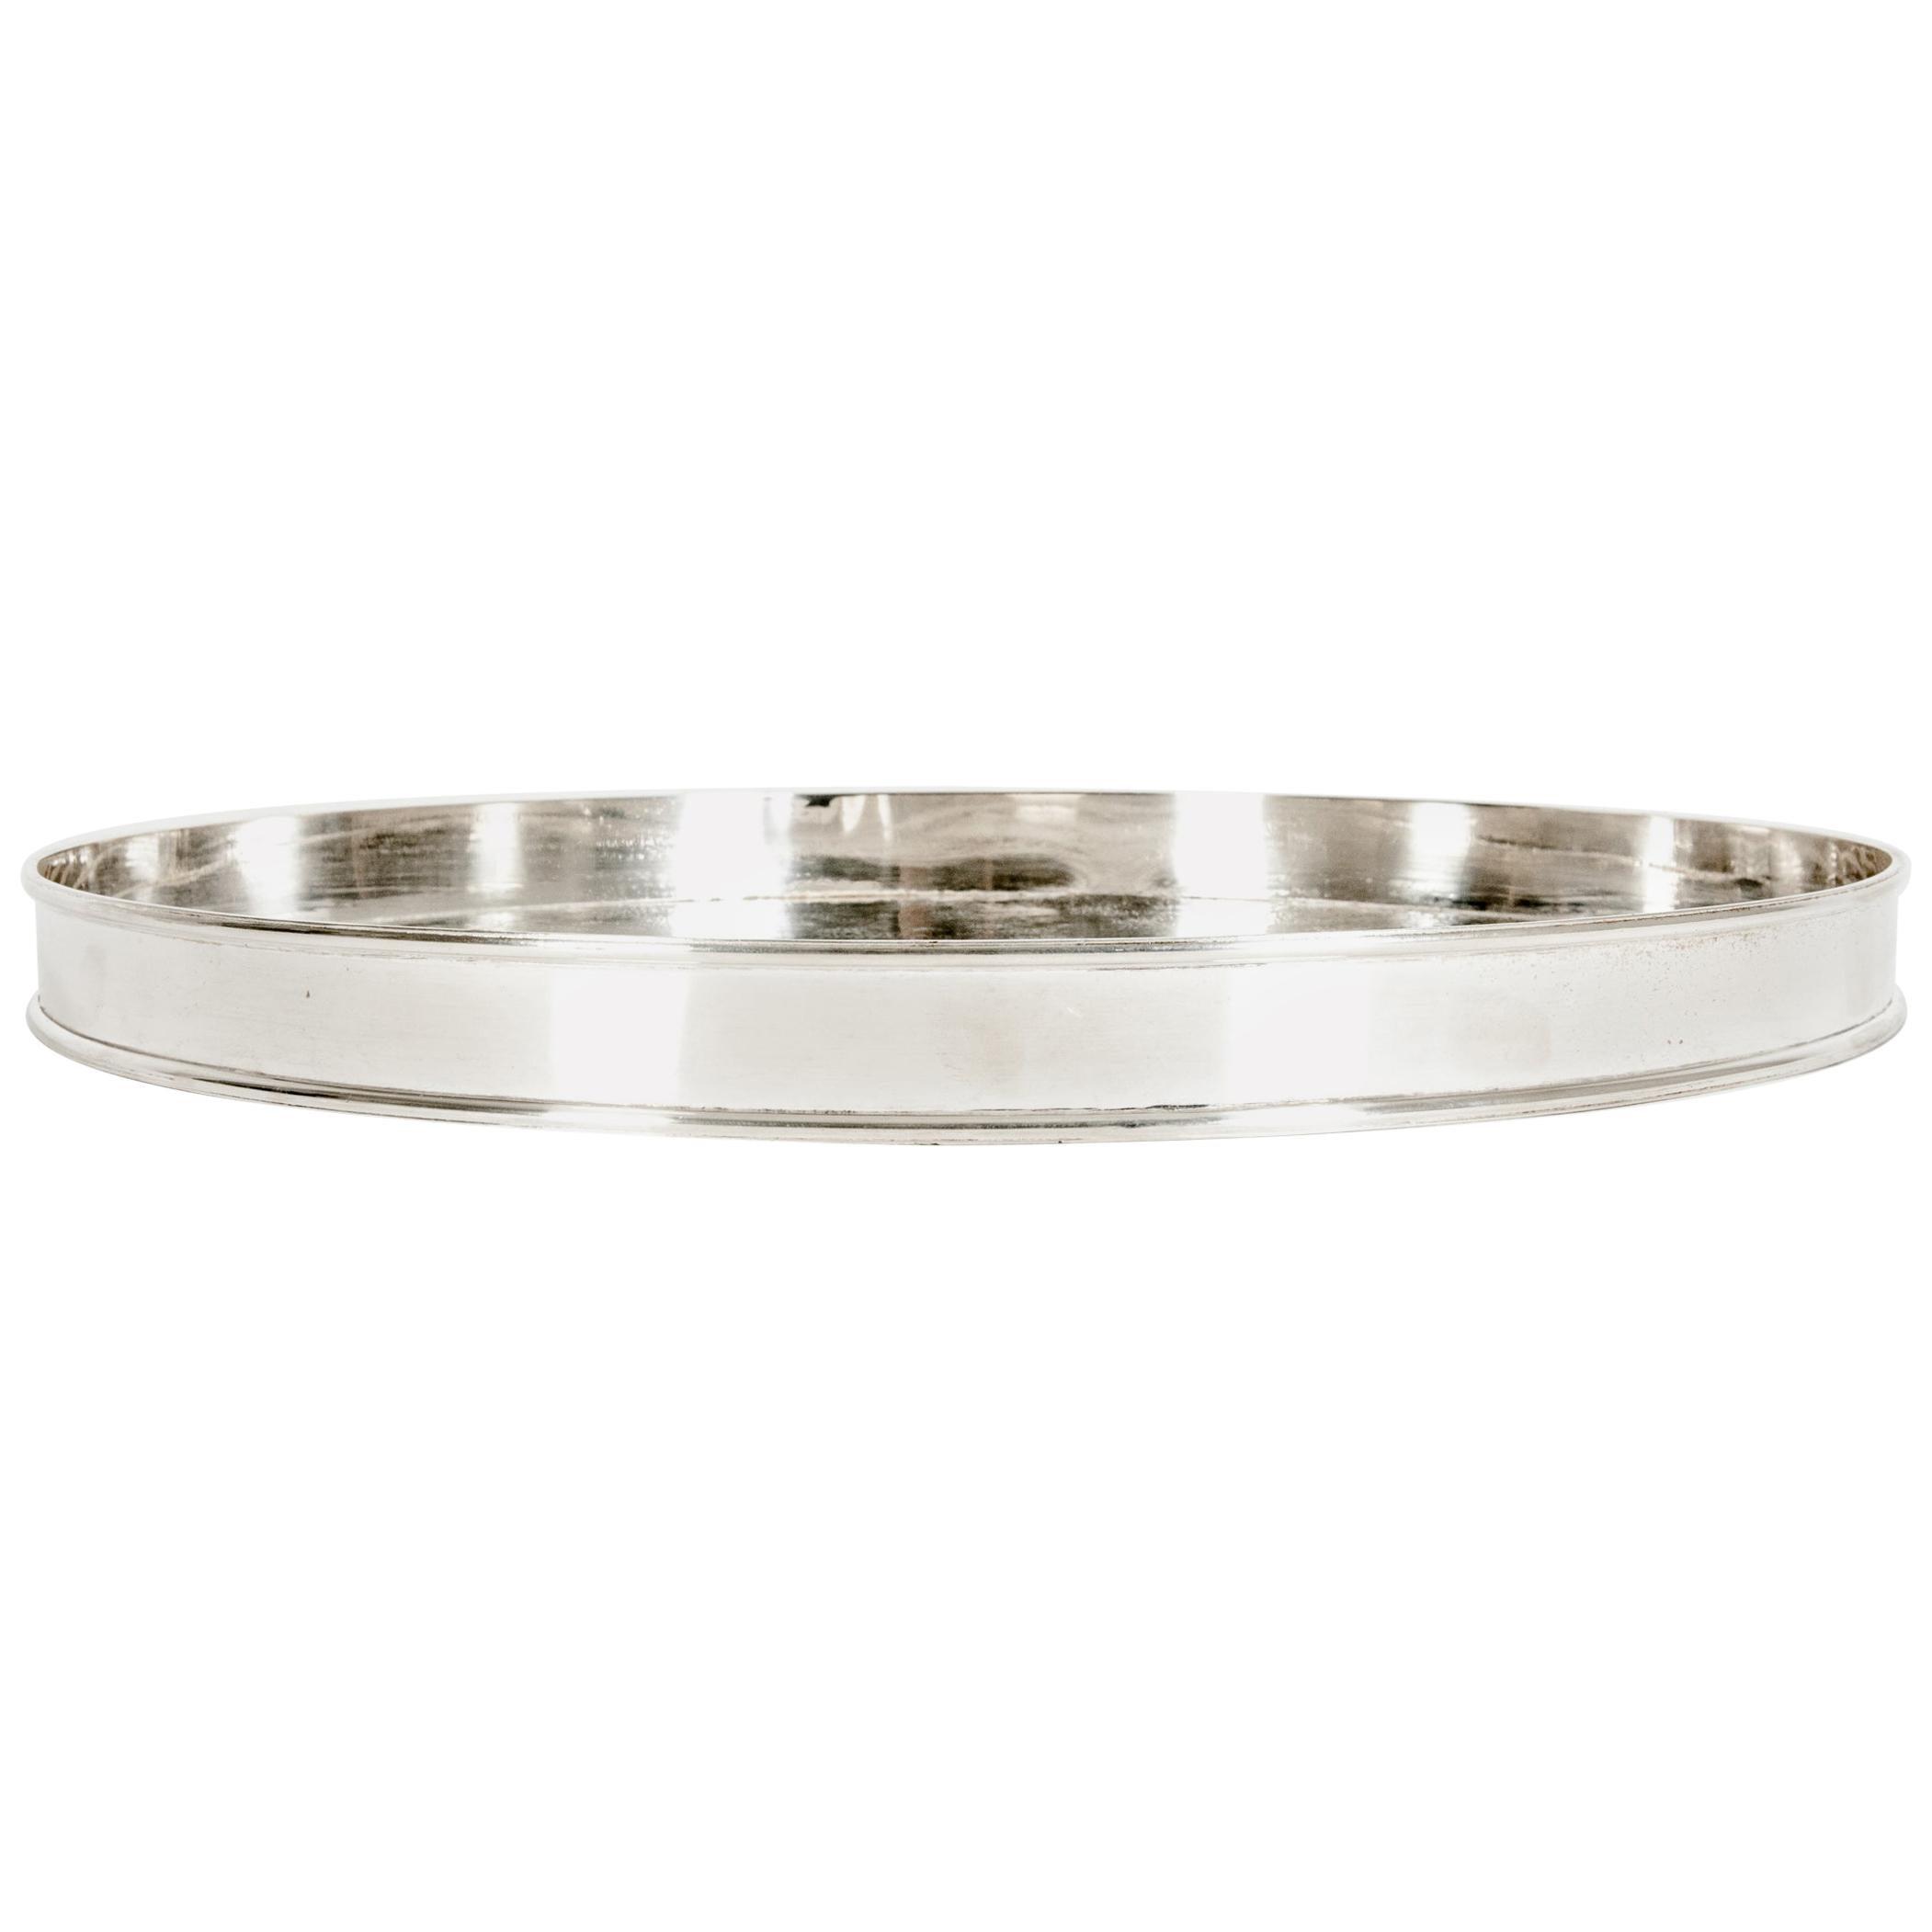 English Sheffield Silver Plated Barware / Tableware Tray